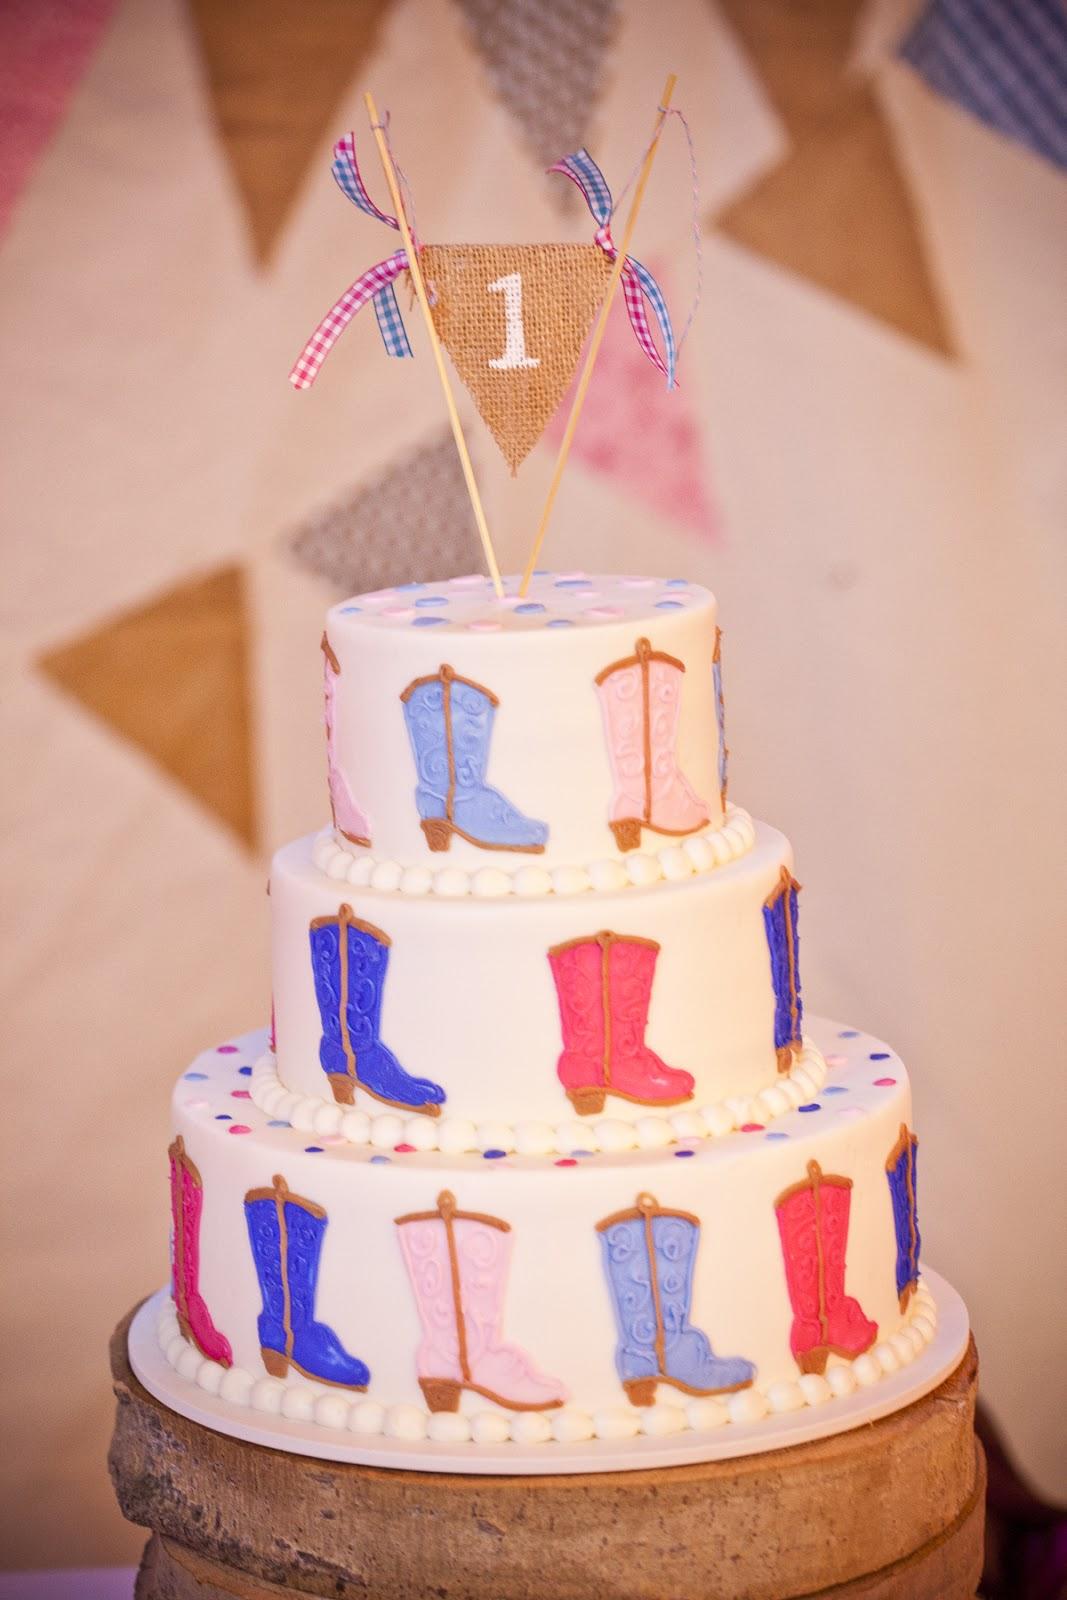 10 Cowboy Boot Cakes For Boys Photo - Cowboy Boot Cake, Cowboy ...